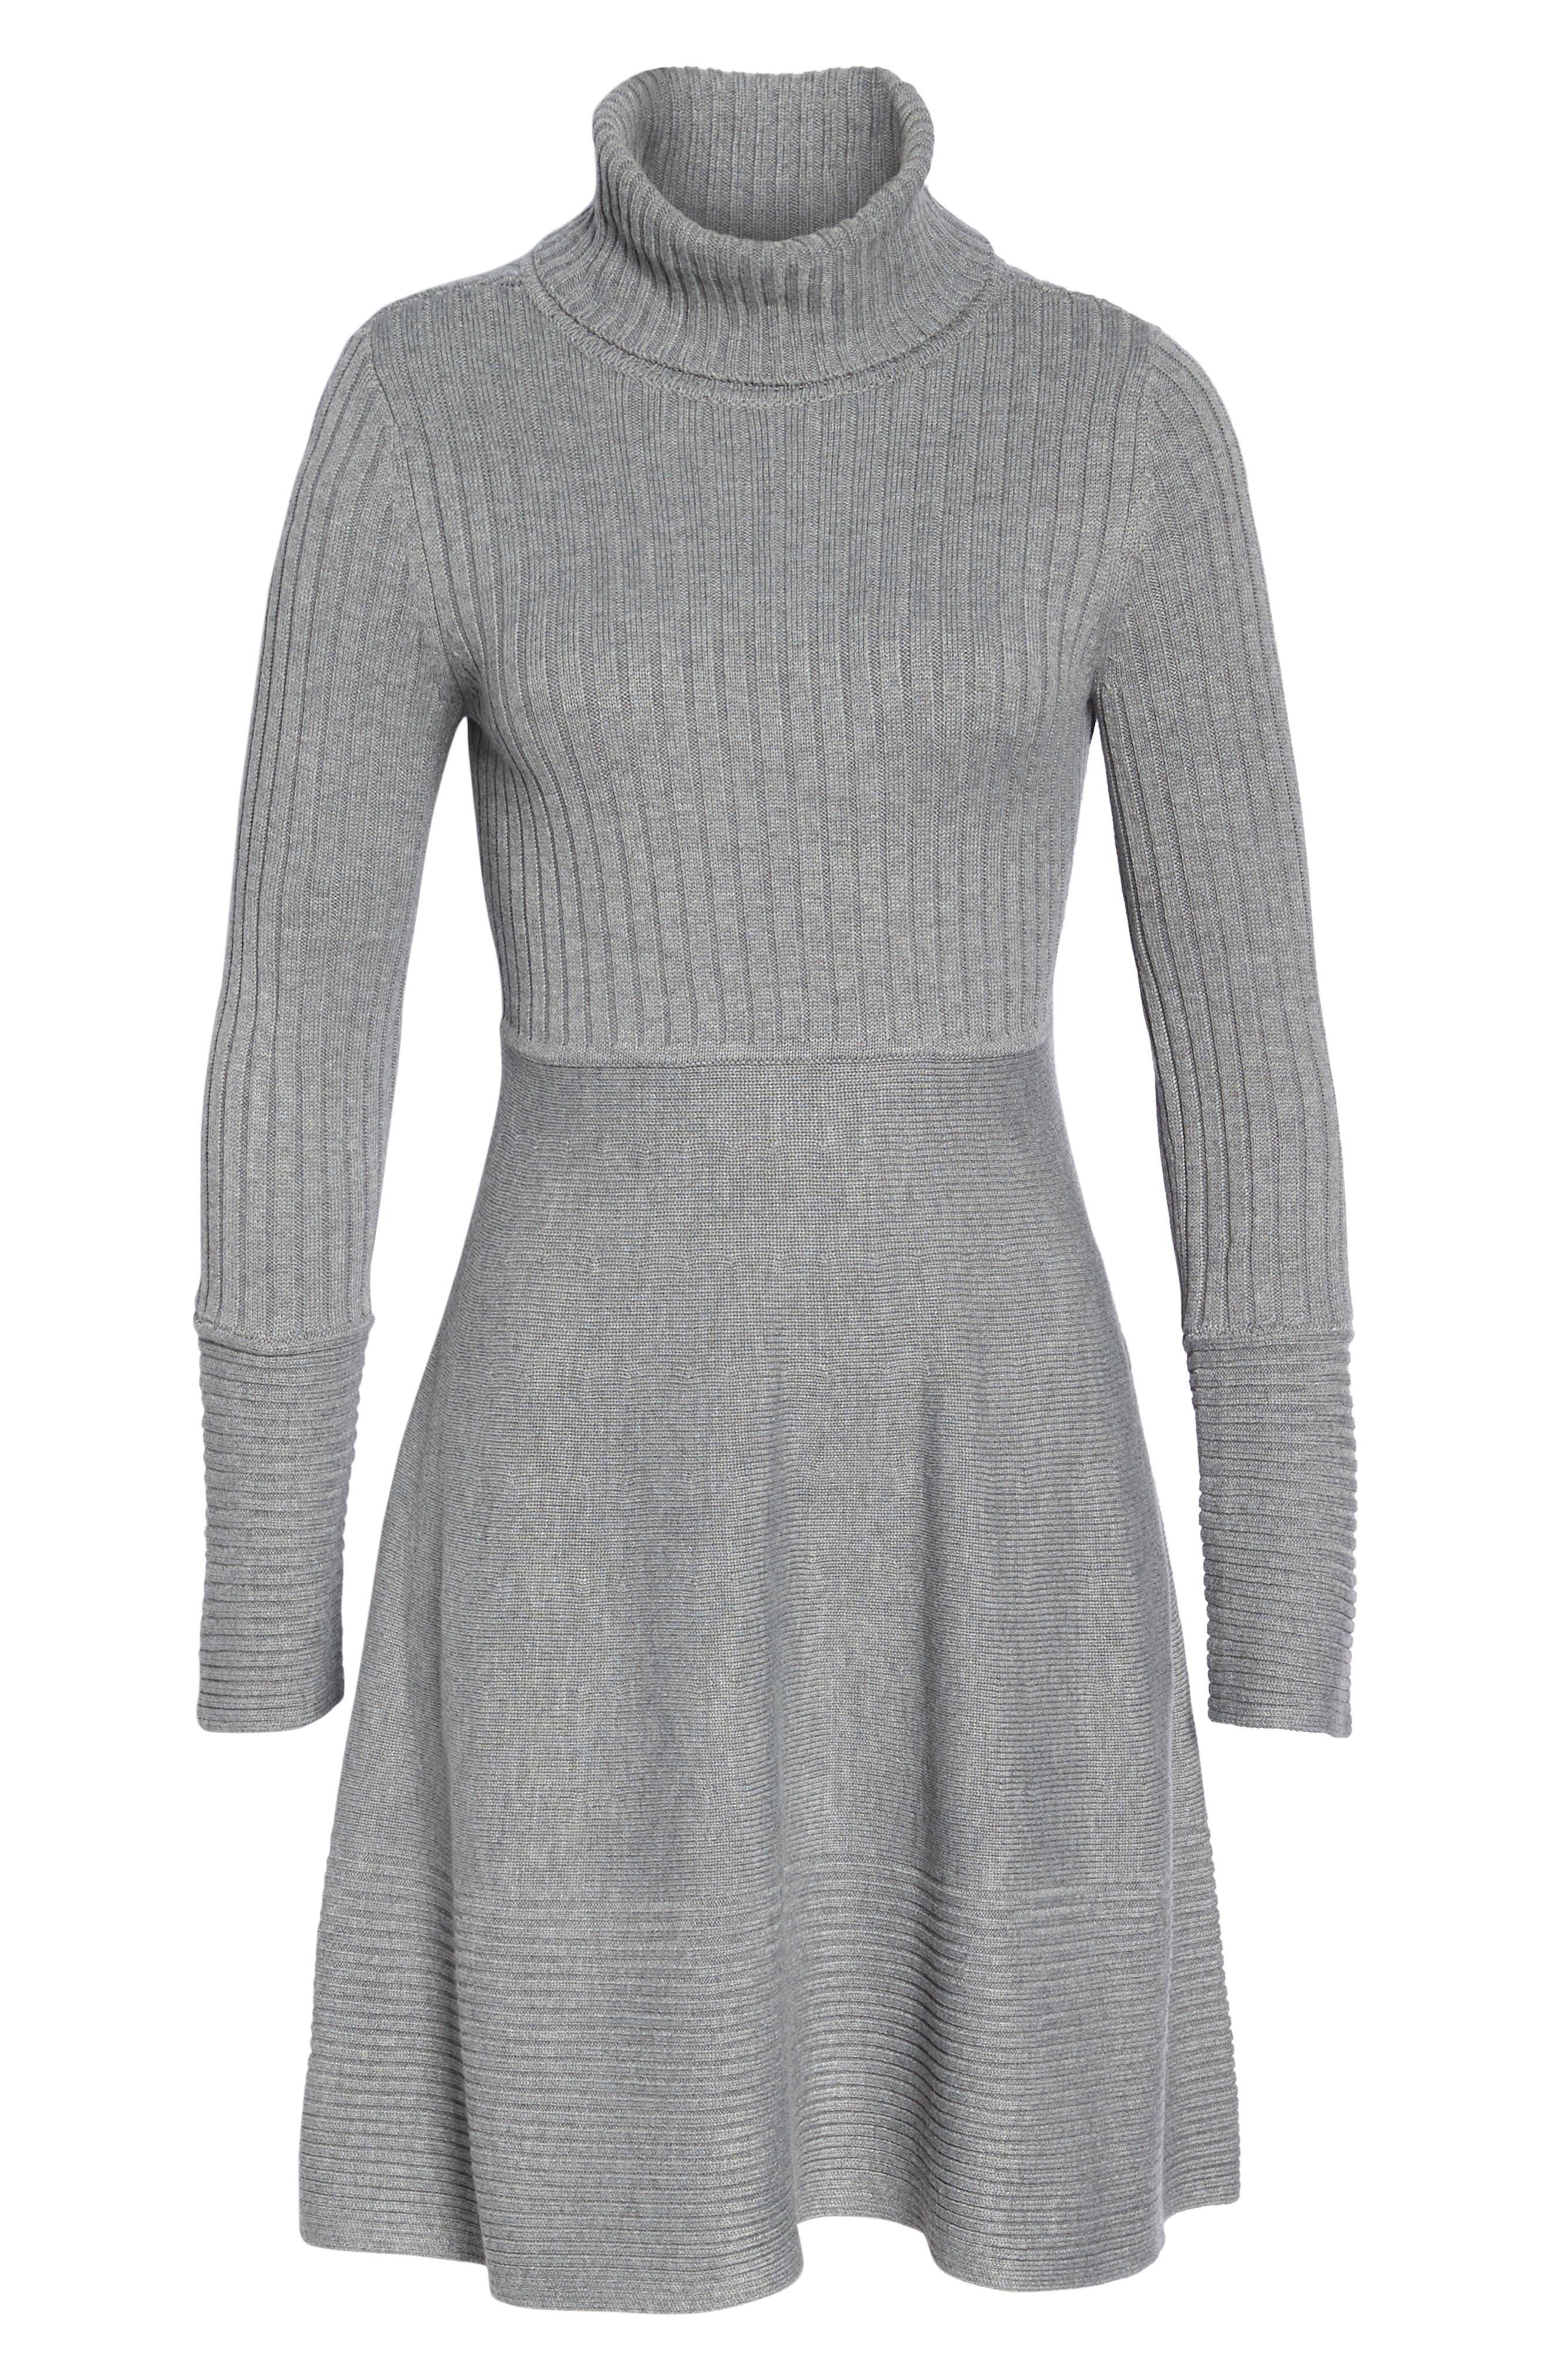 ELIZA J, Turtleneck Sweater Dress, Alternate thumbnail 8, color, GREY